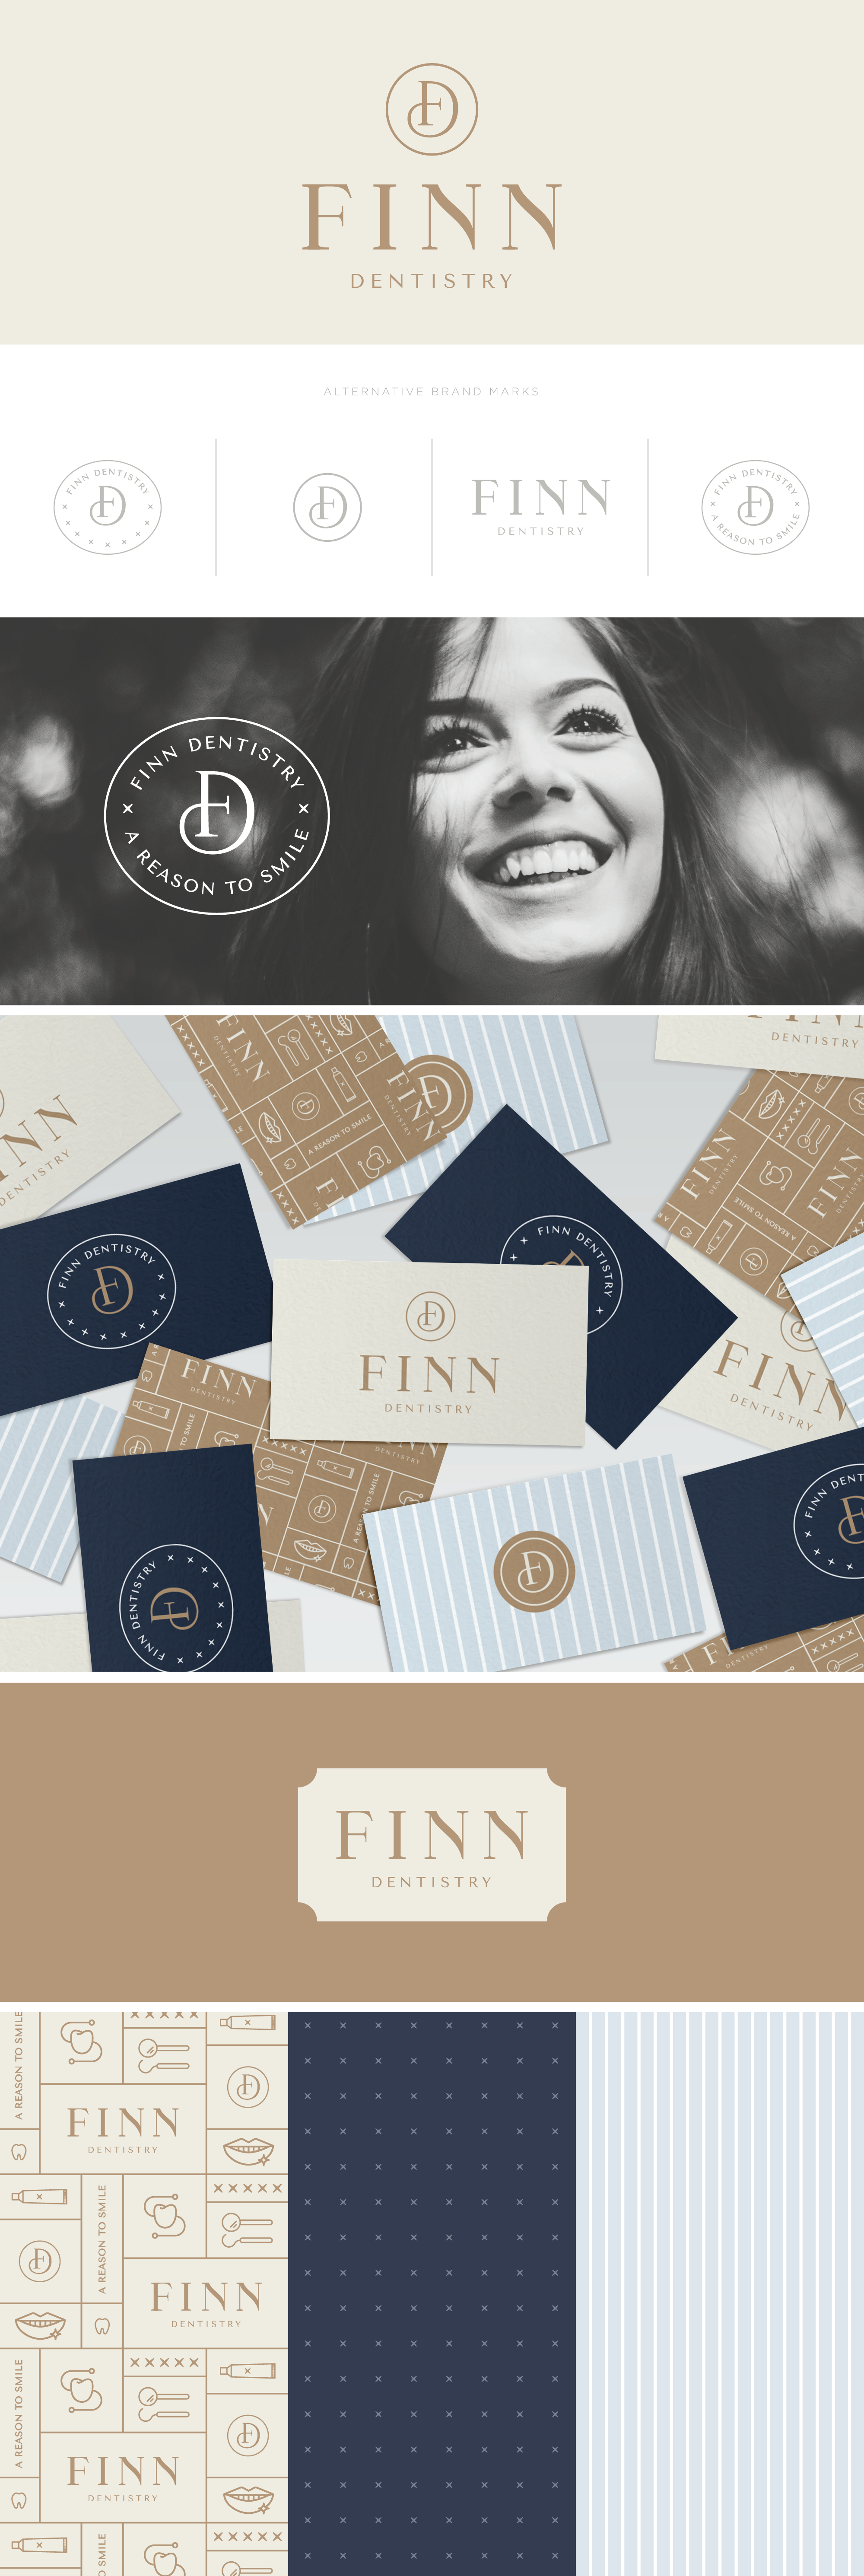 Finn Dentistry Brand Design | Pace Creative Design Studio